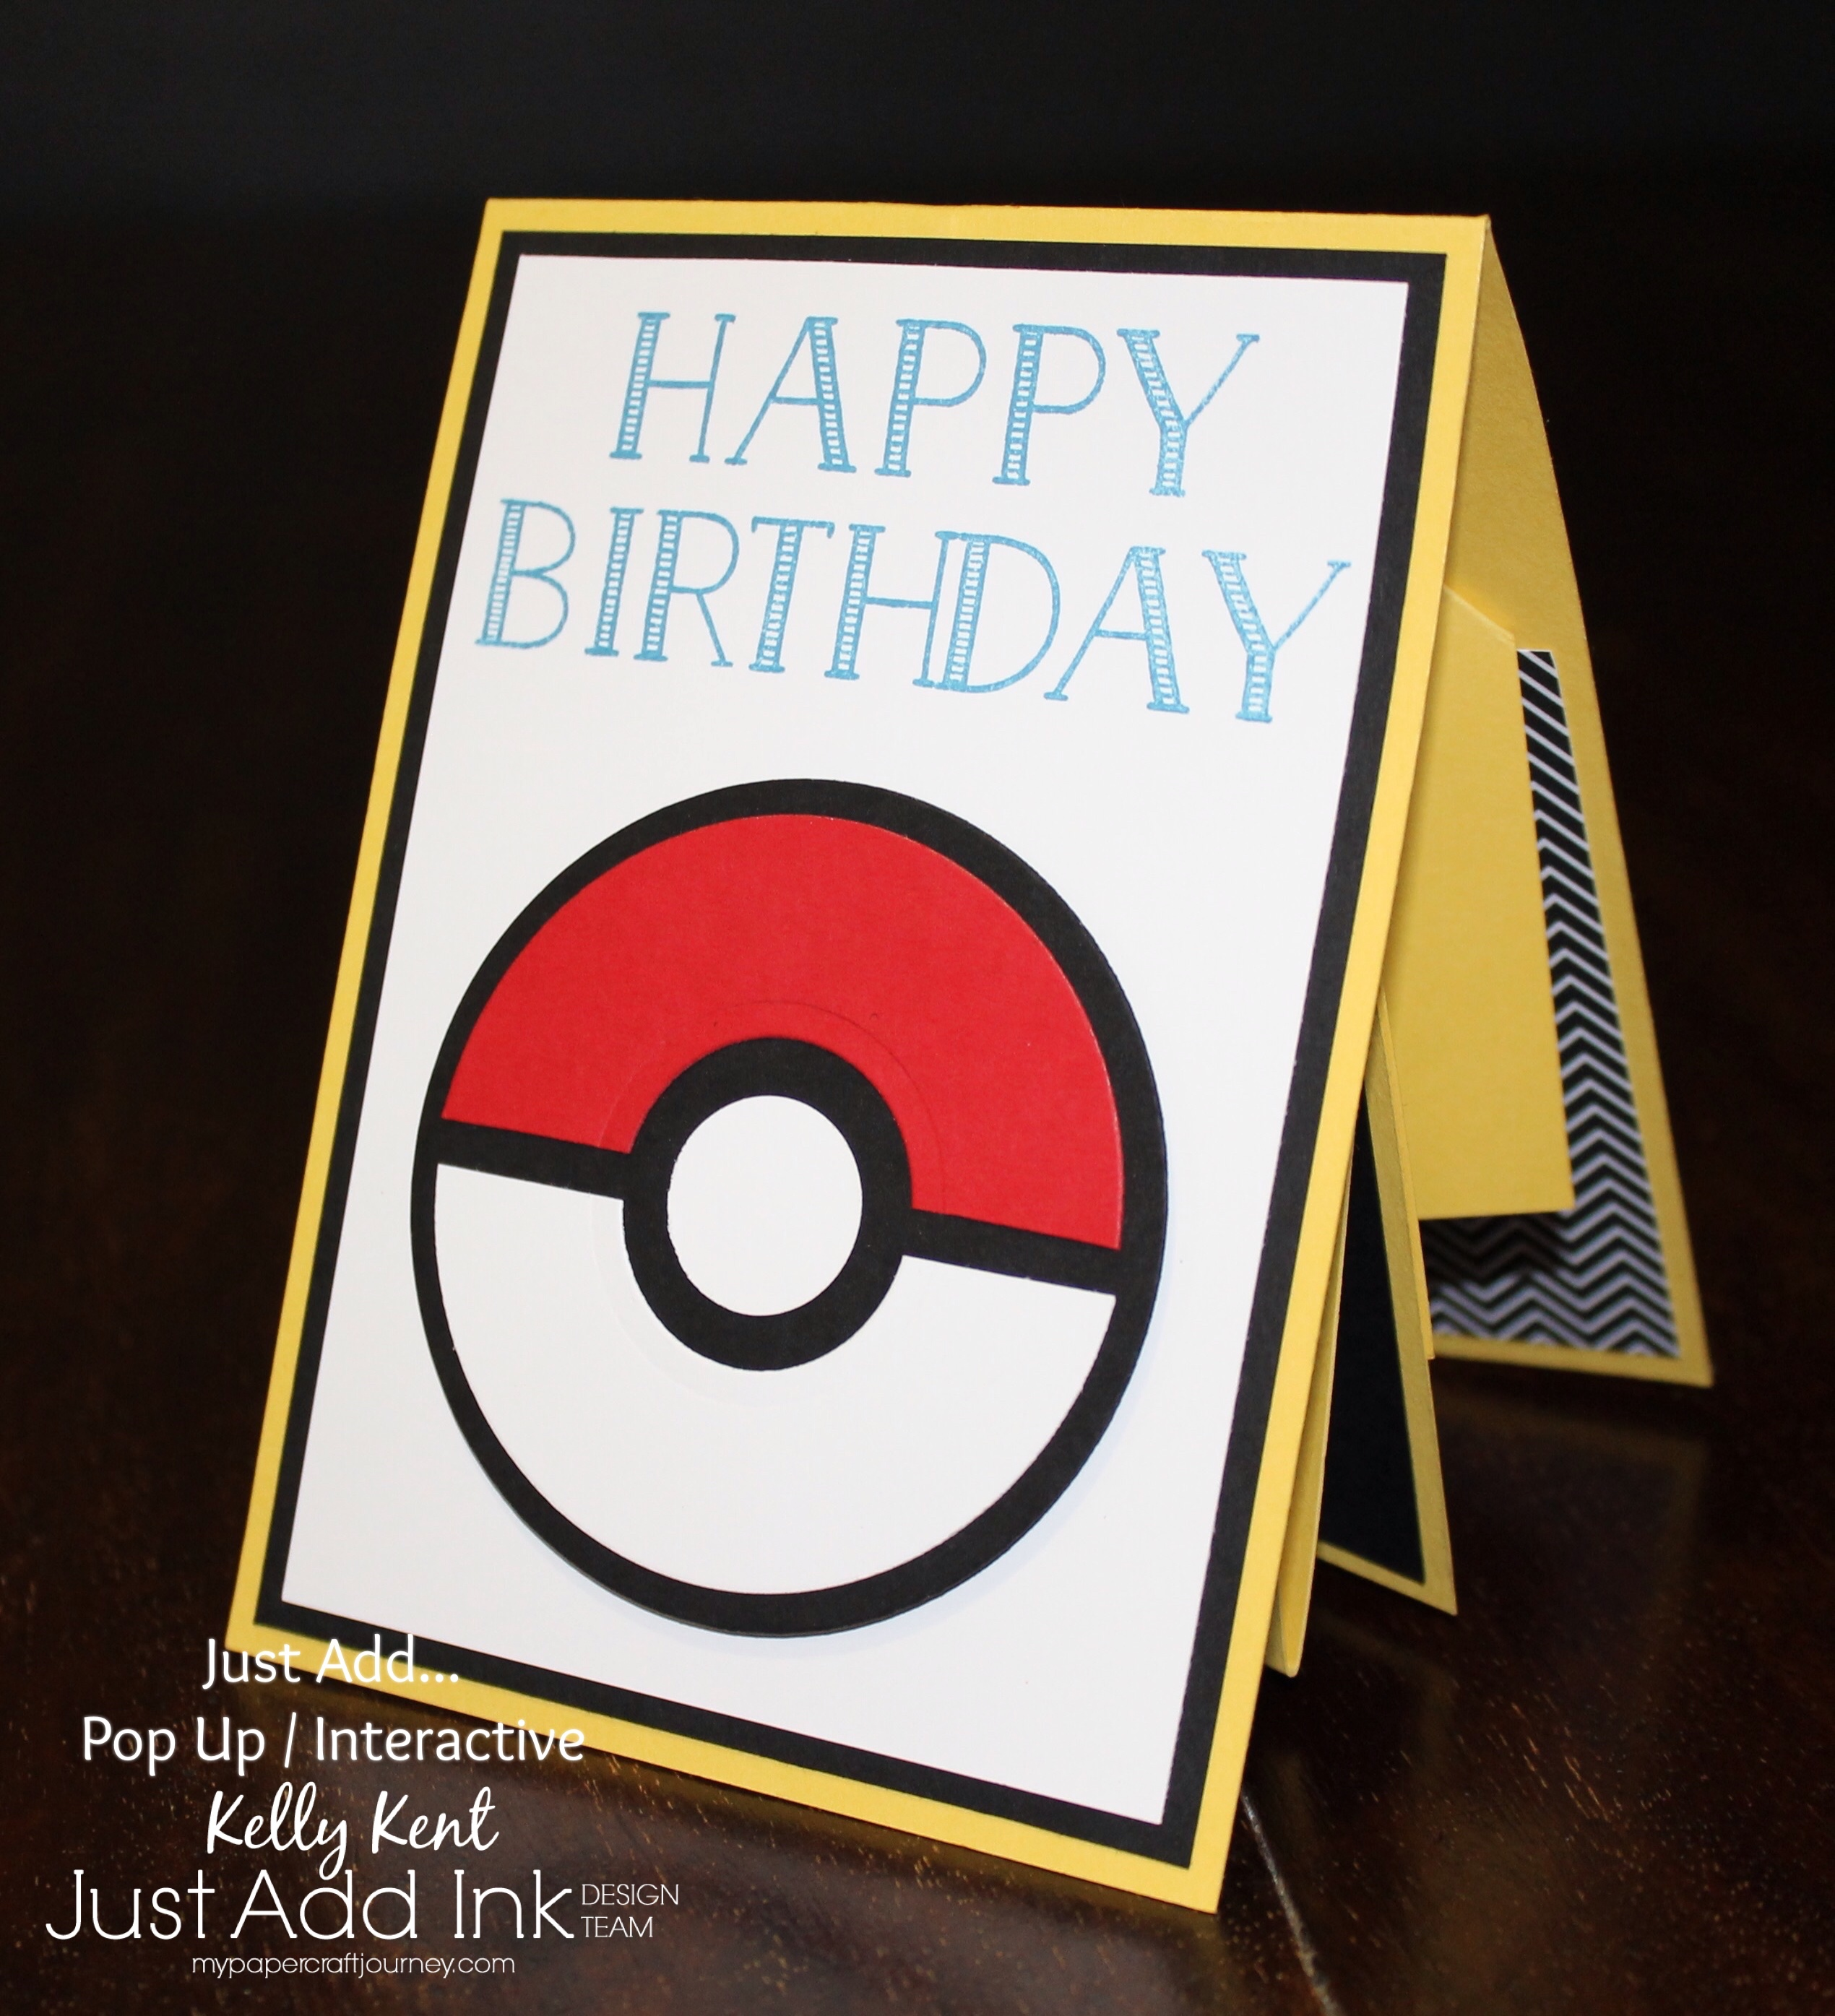 Just Add Ink #343 Twist & Pop Pokemon Card. Kelly Kent - mypapercraftjourney.com.